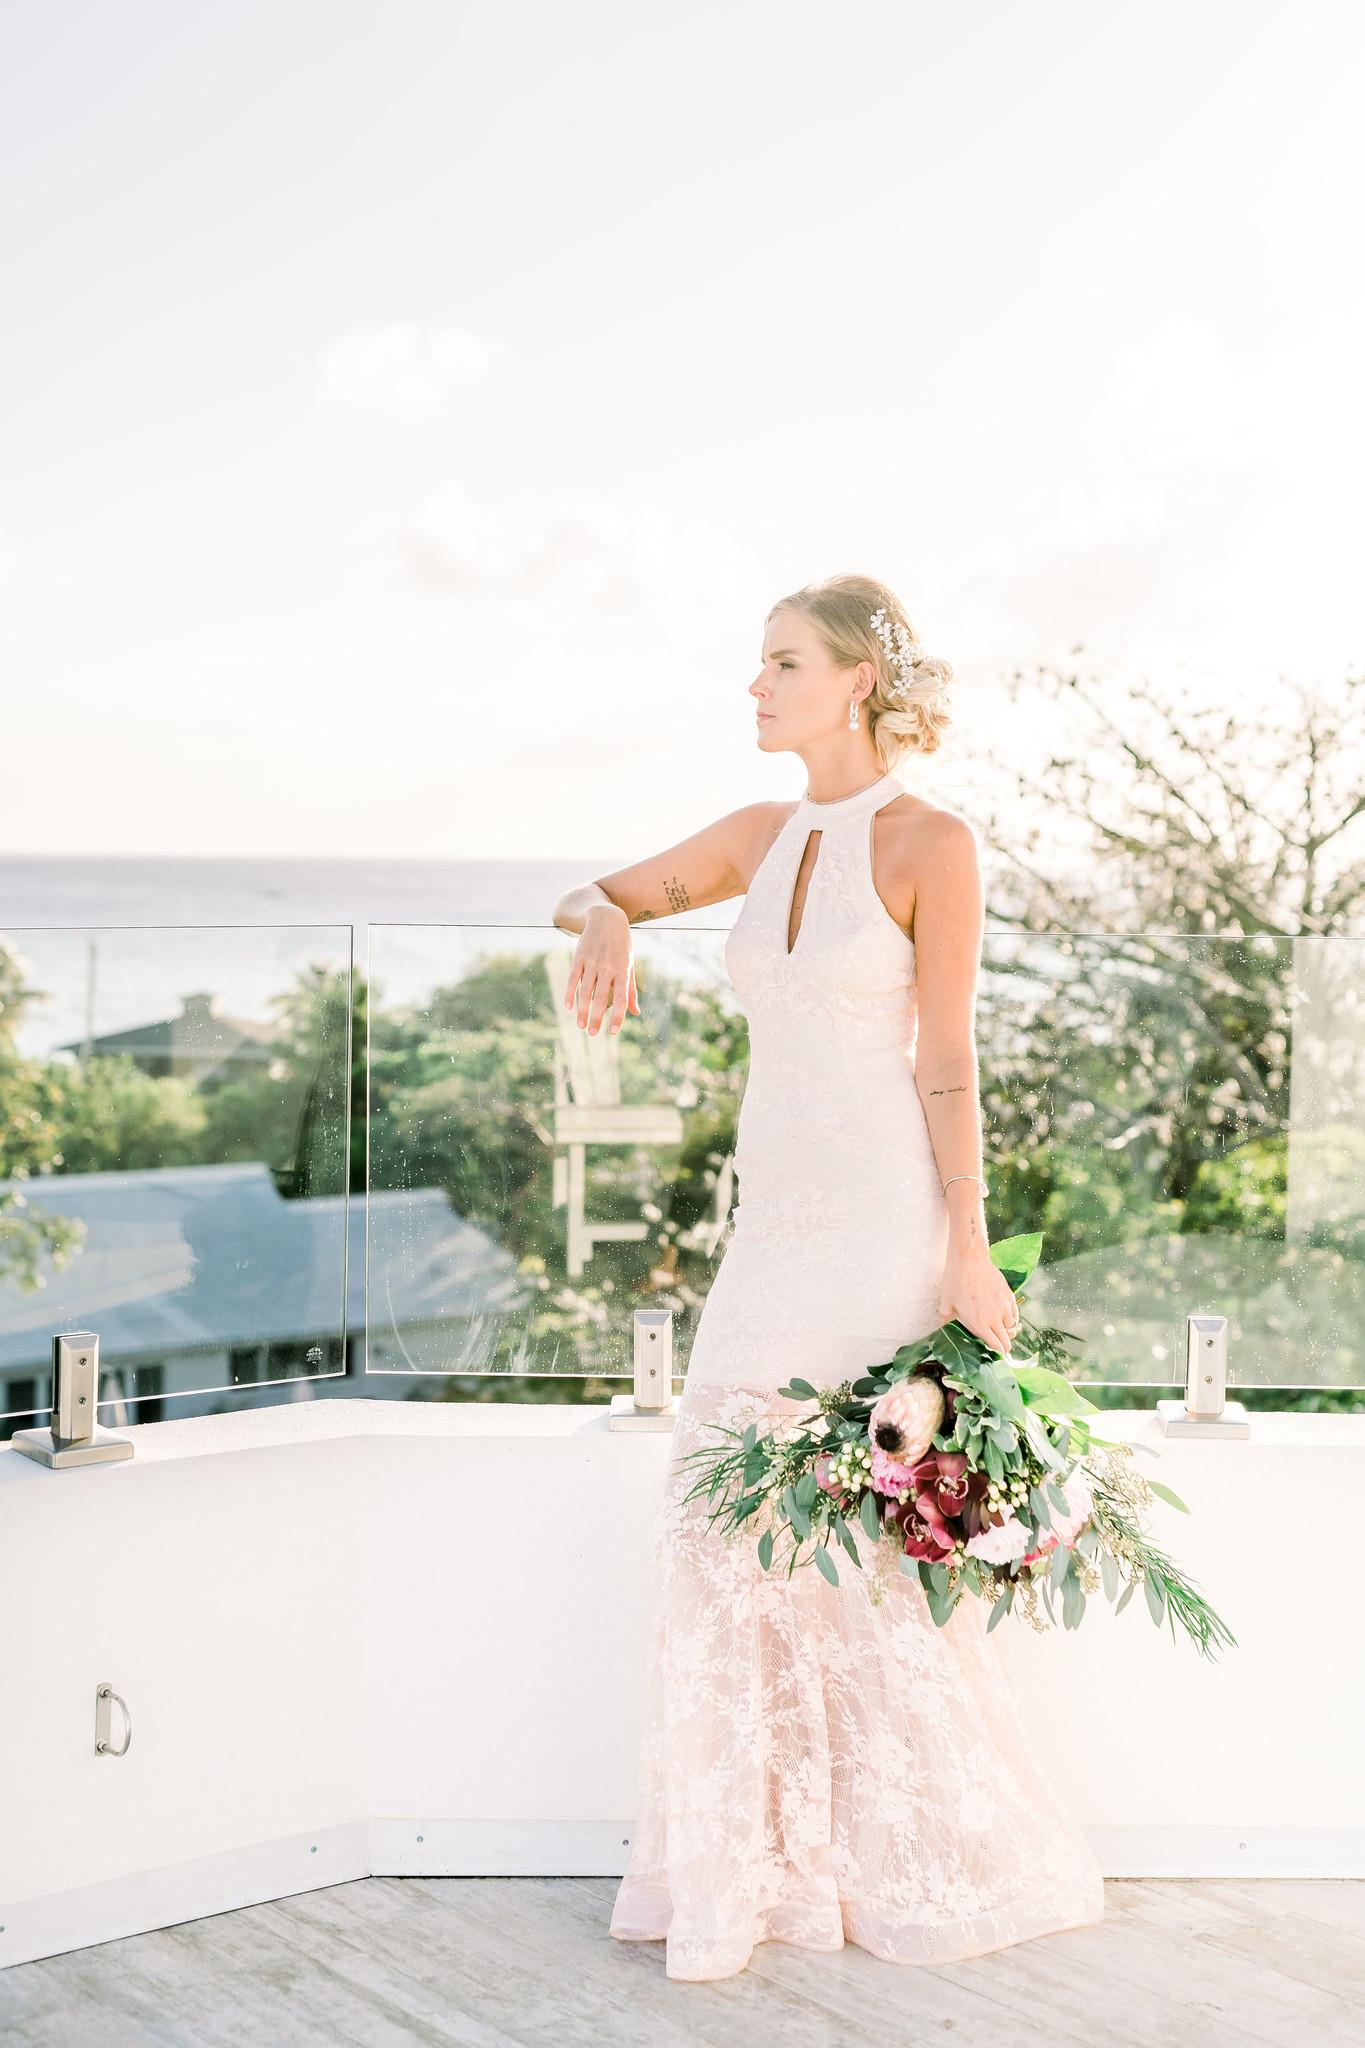 The-Flower-Dell-Bright-Bride.jpg